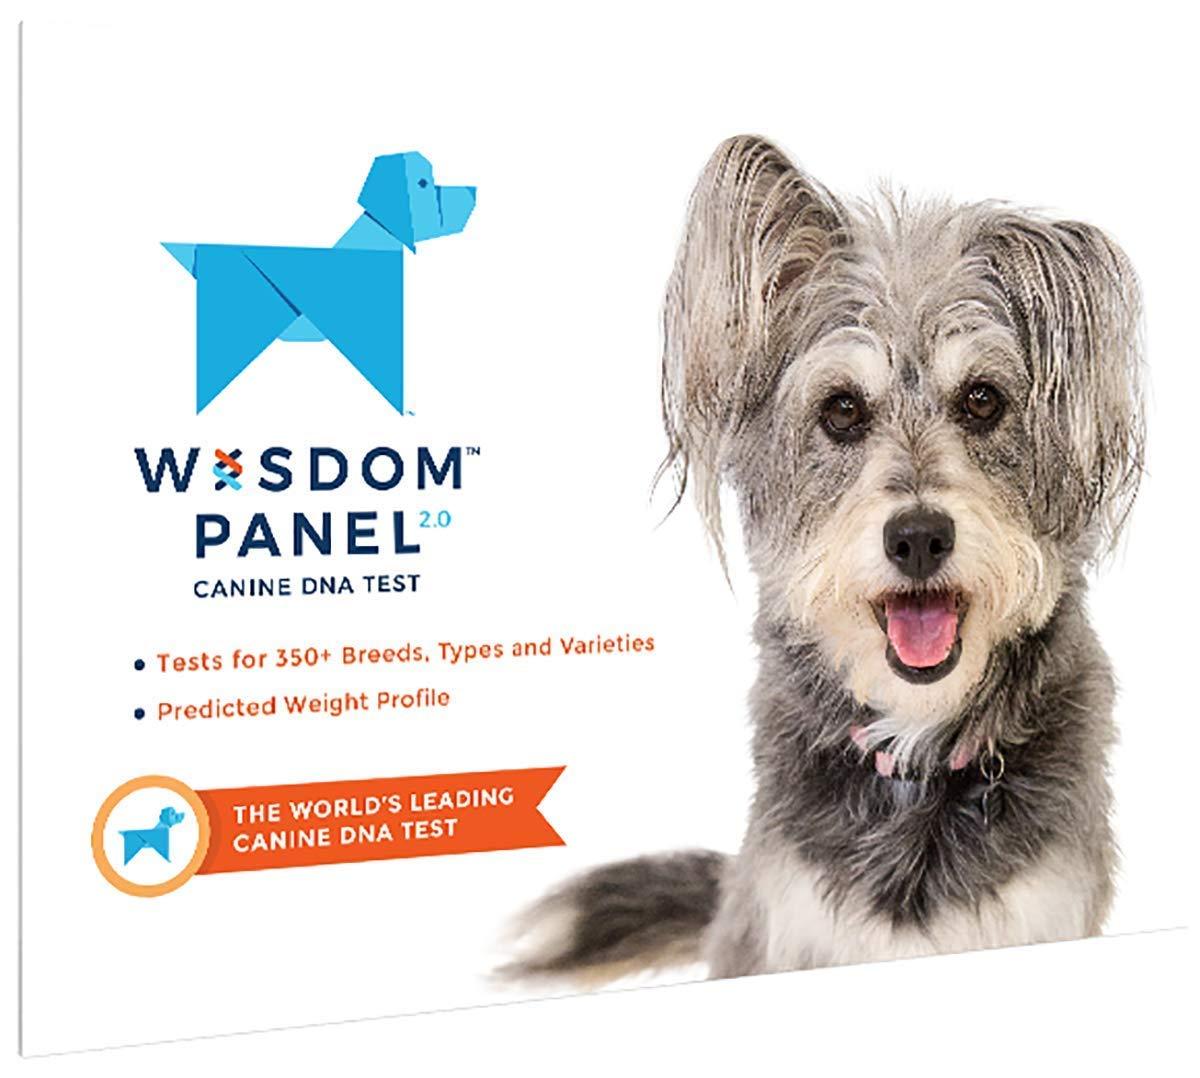 Wisdom Panel 2.0 Dog DNA test £41.25 @ Amazon